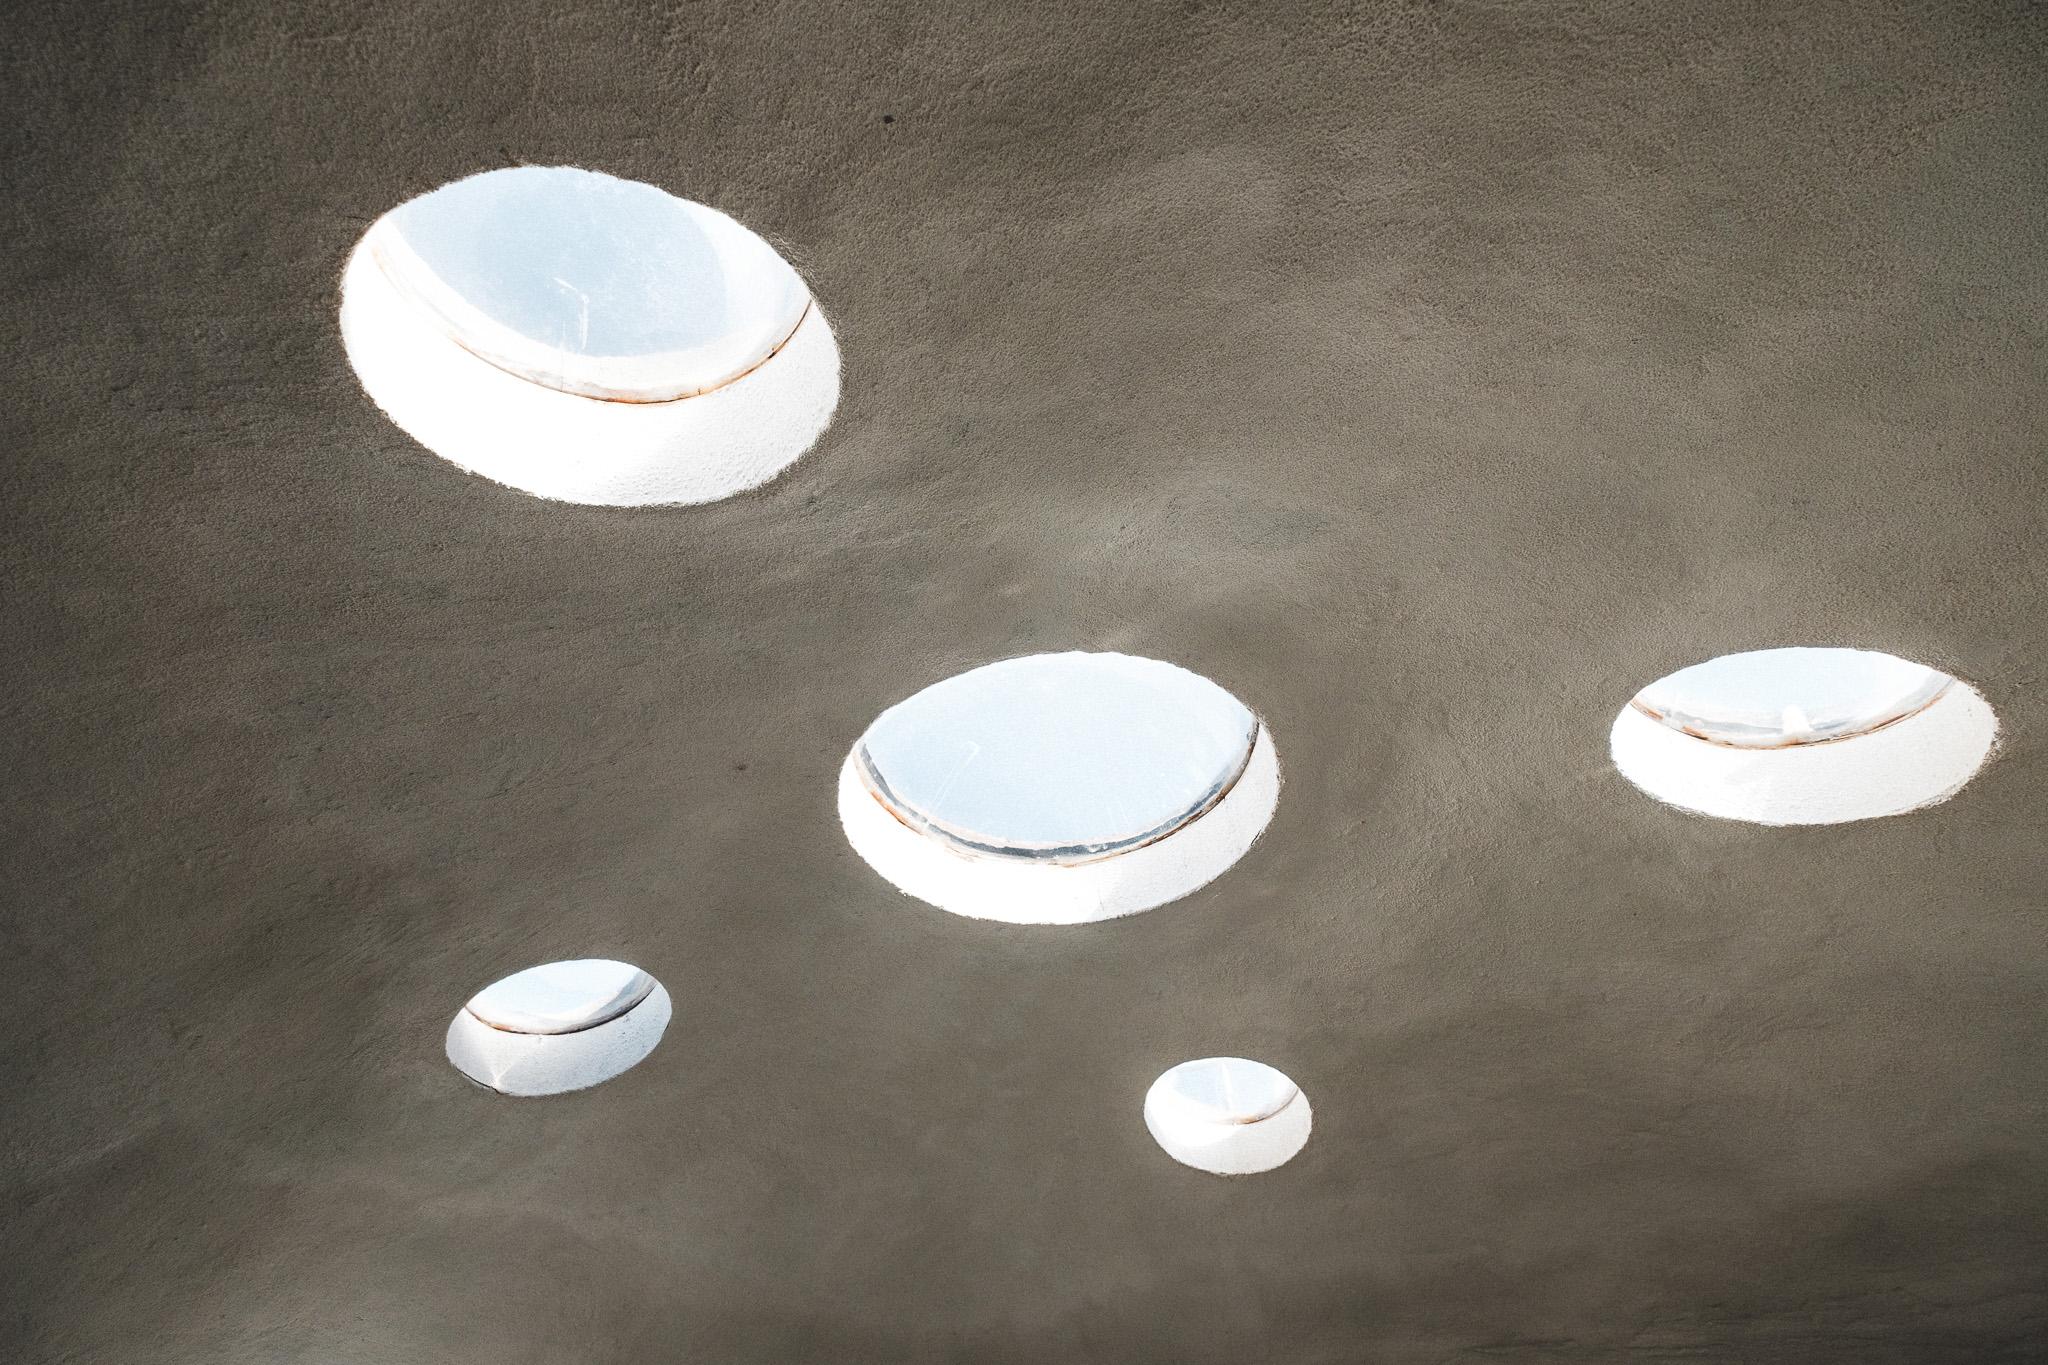 ufo-009.jpg